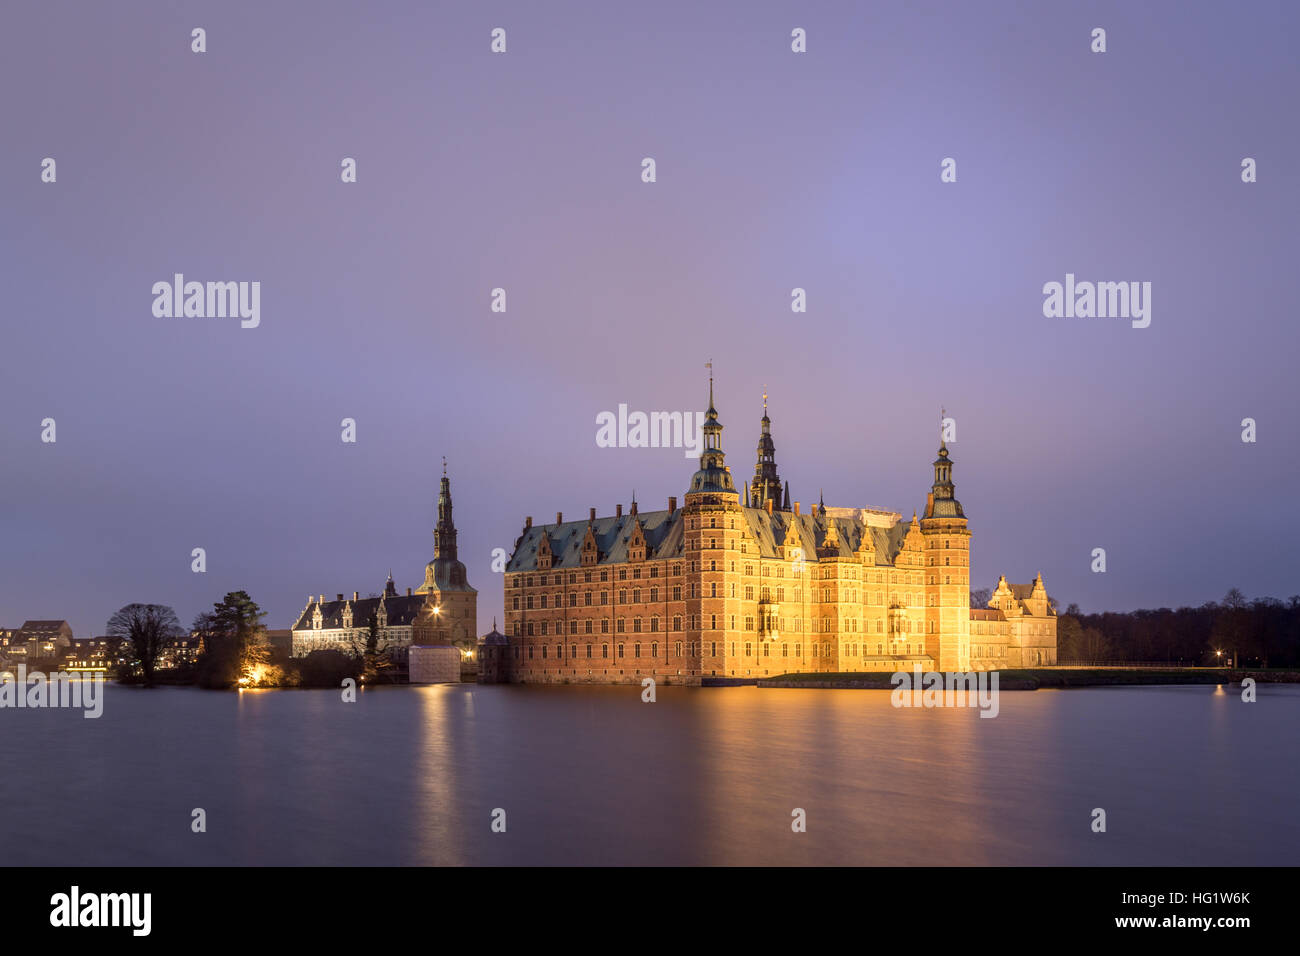 Hillerod, Denmark - December 29, 2016: View of the illuminated Frederiksborg Palace - Stock Image